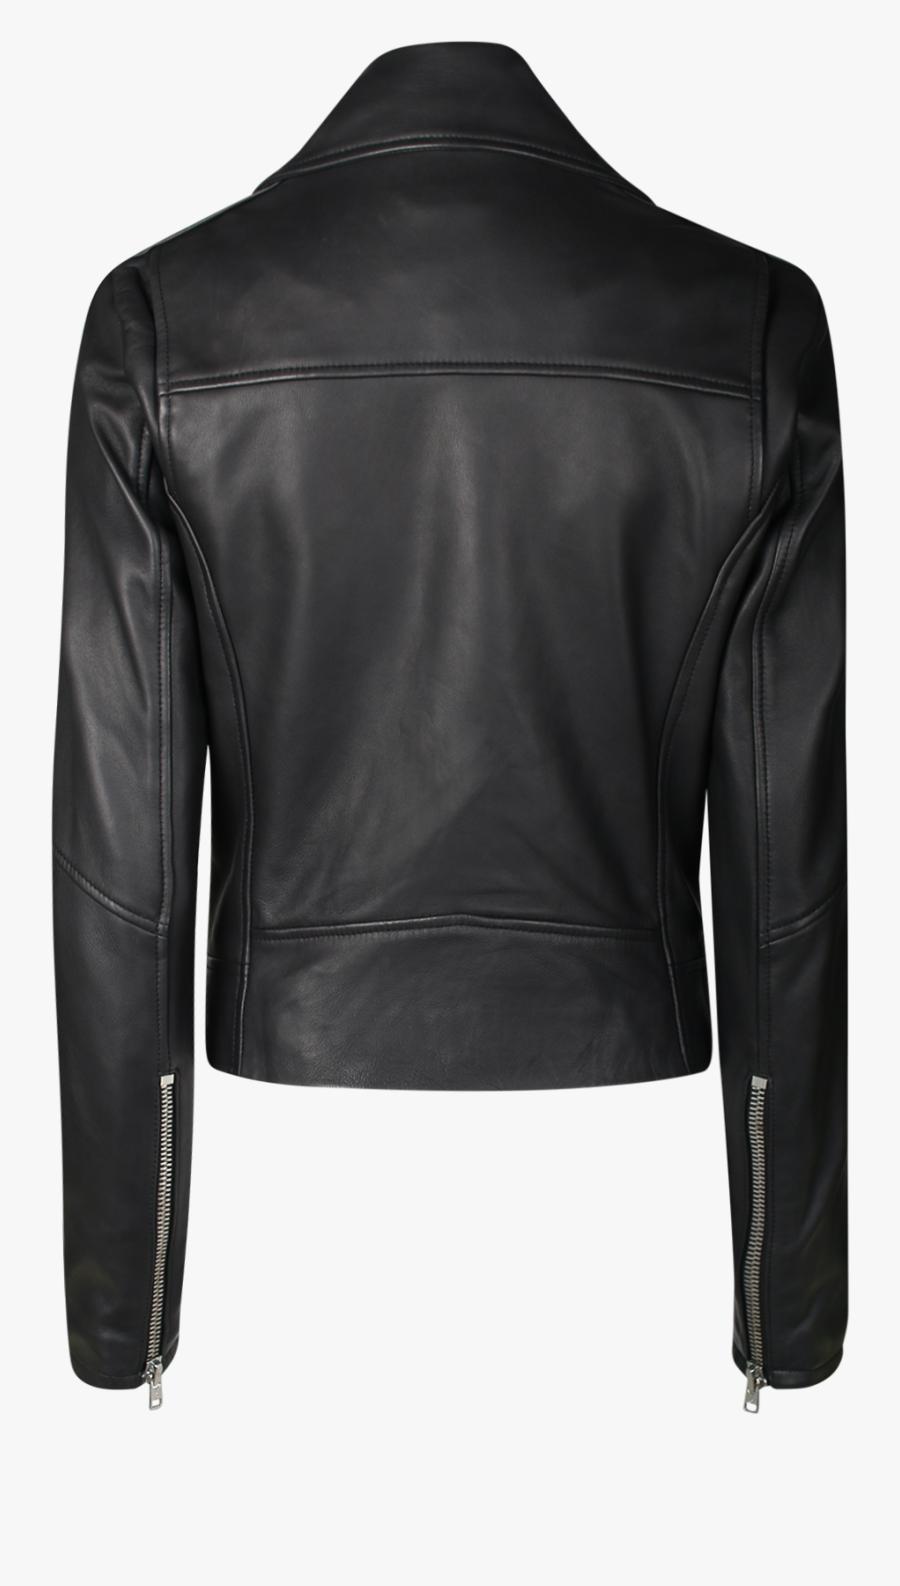 Dante Official Online Store - Leather Jacket, Transparent Clipart